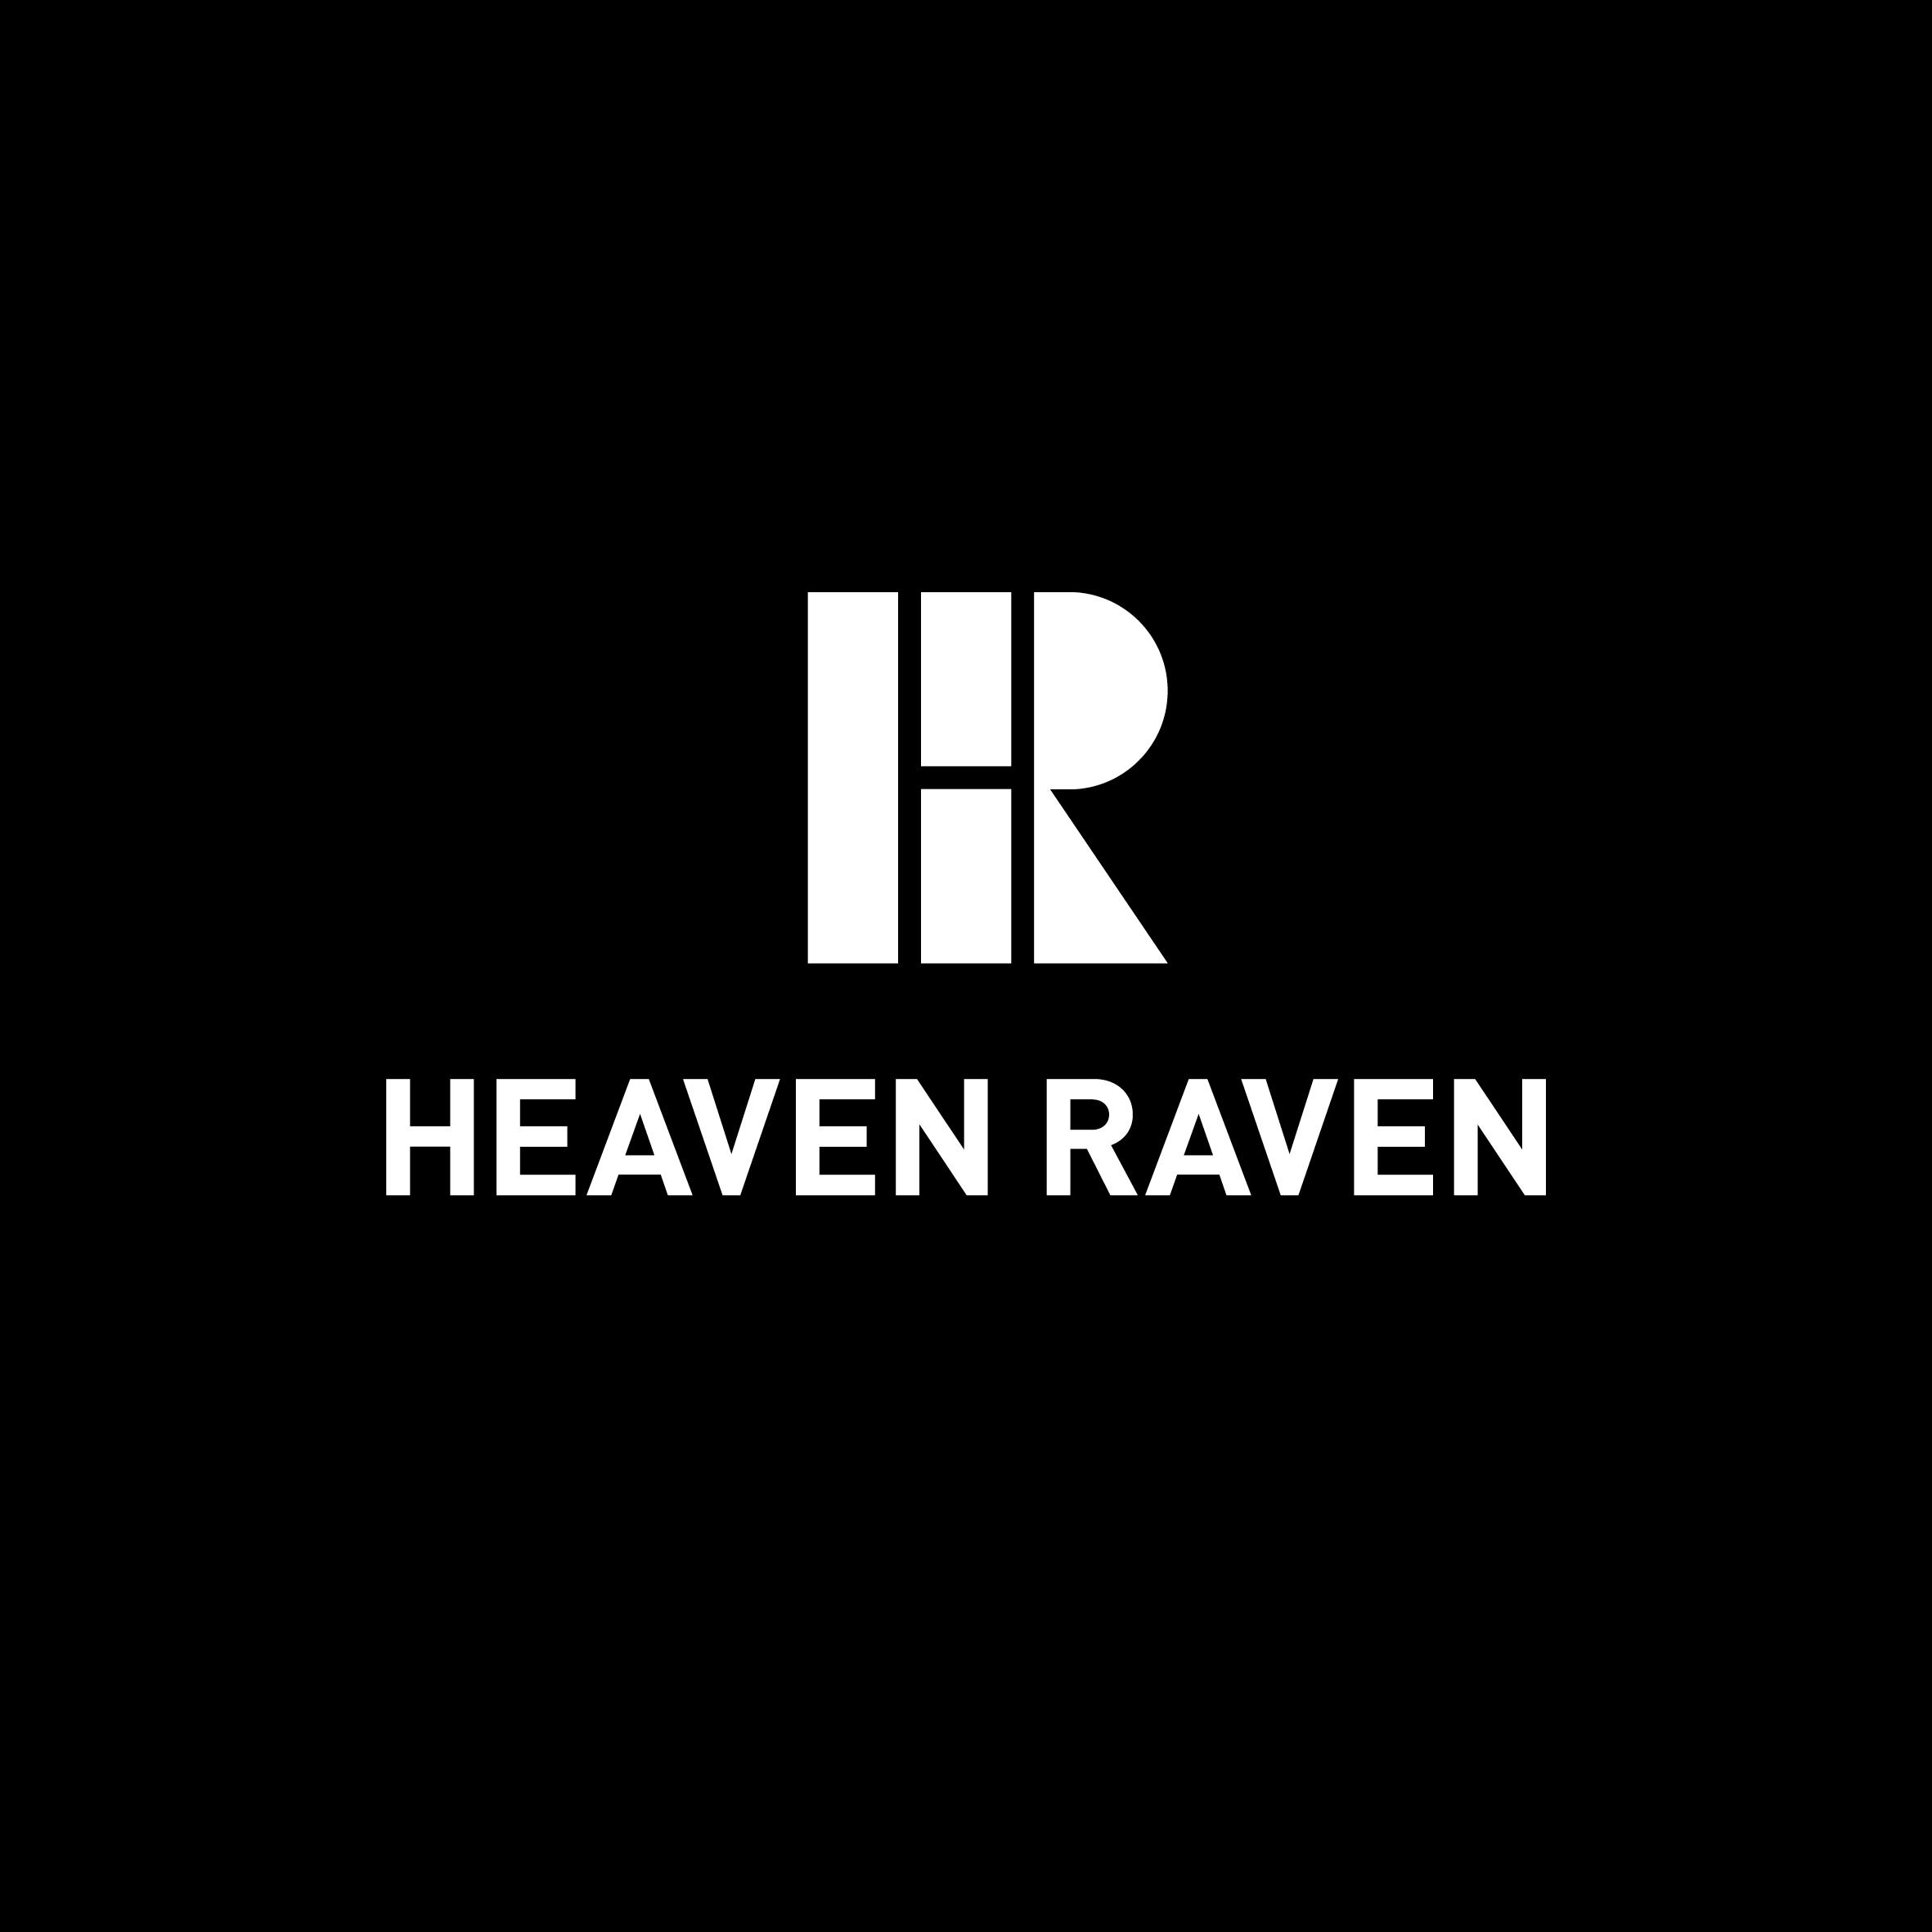 heaven raven_CIdesign